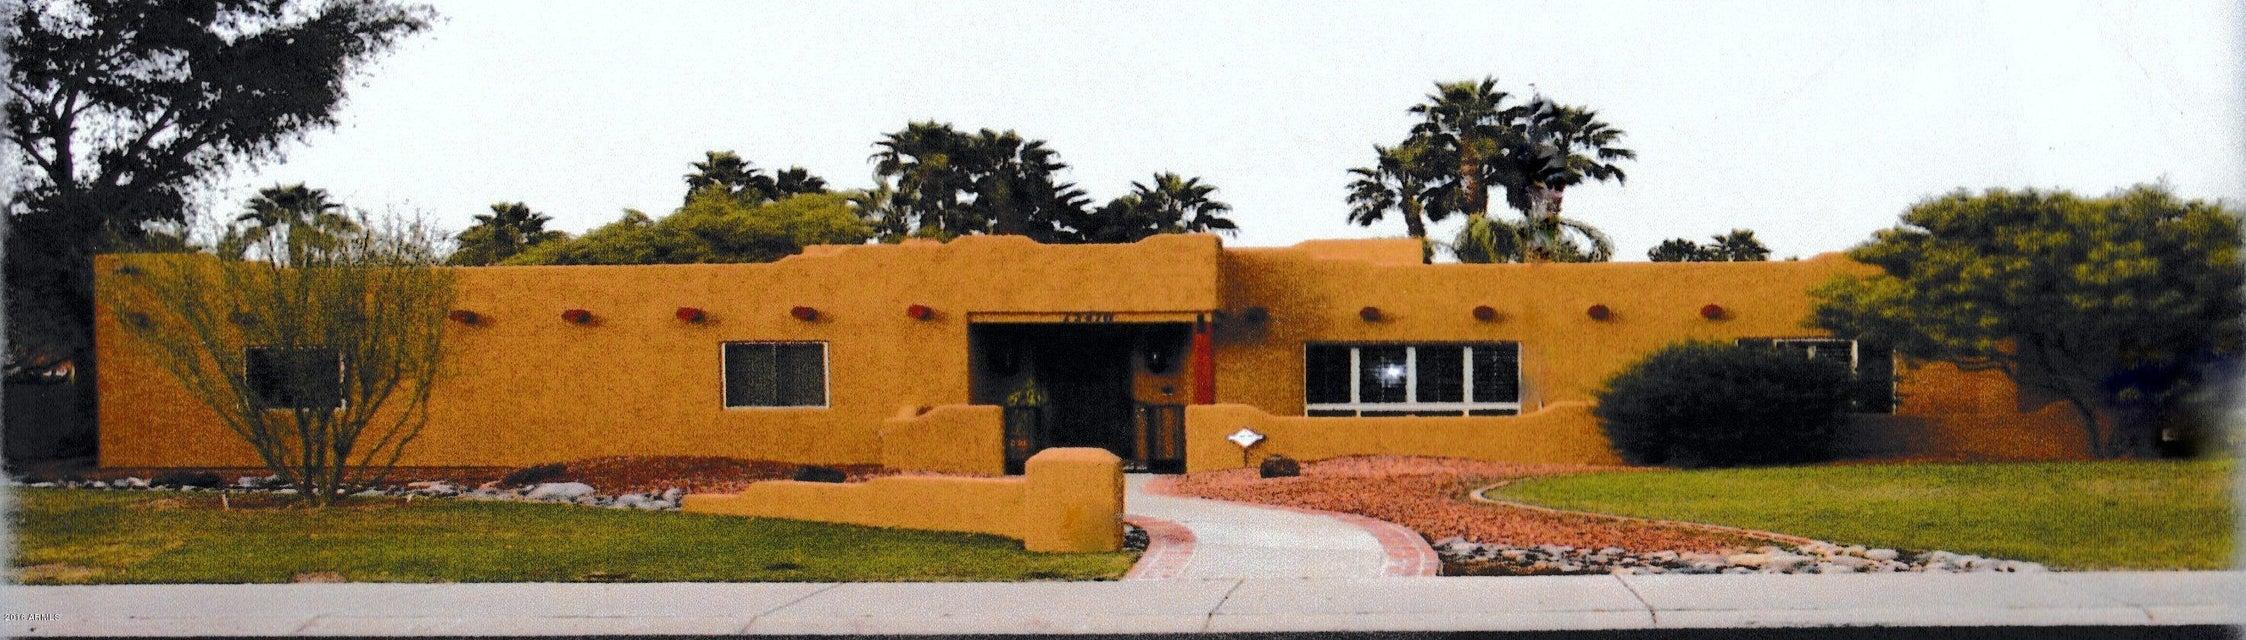 12470 N 79TH Street, Scottsdale AZ 85260